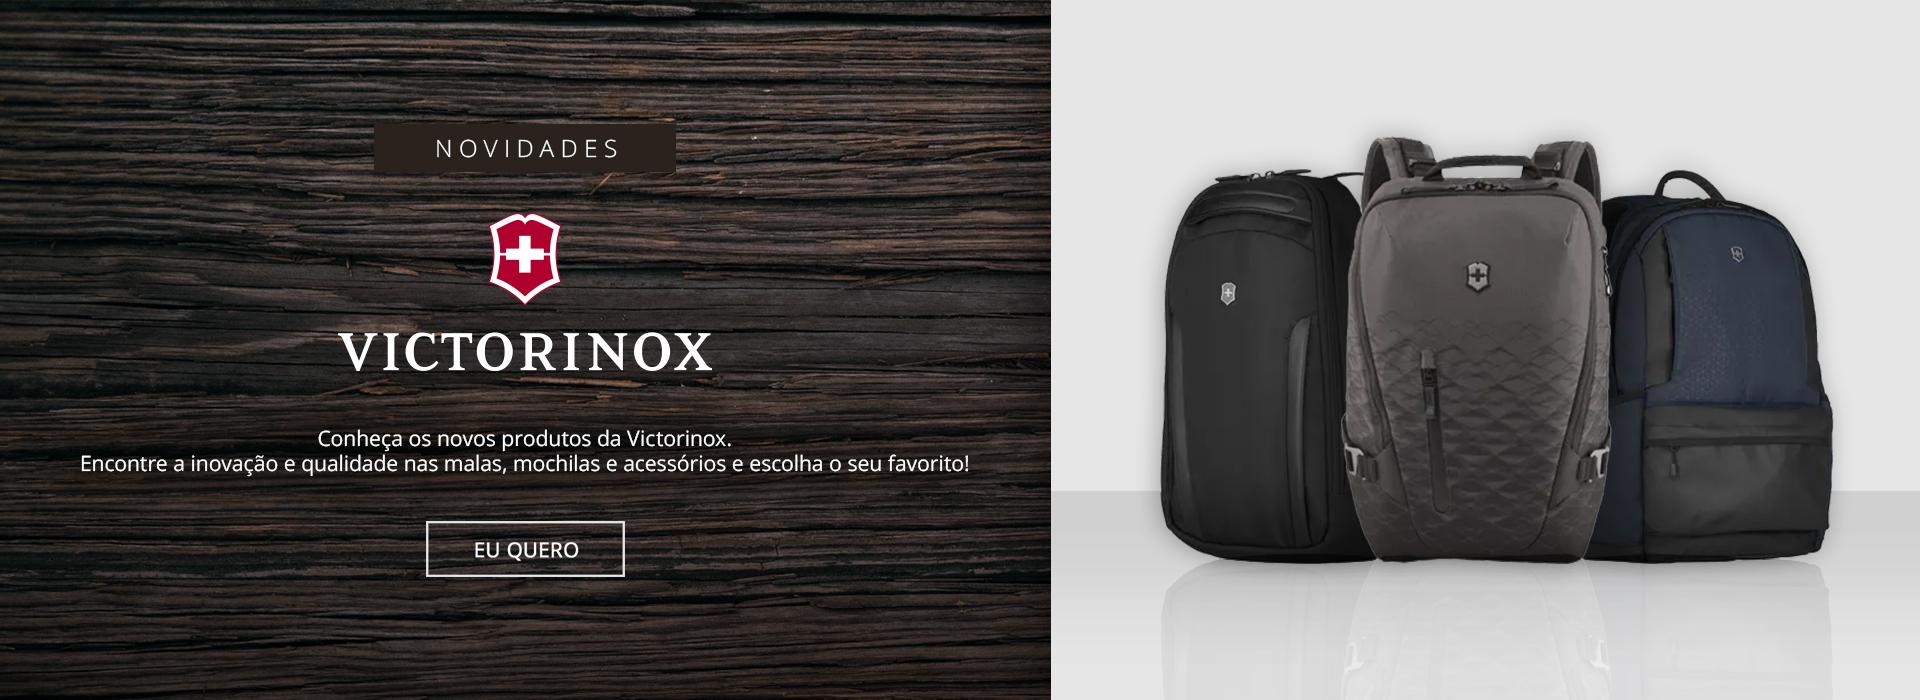 Banner 3 - Victorinox